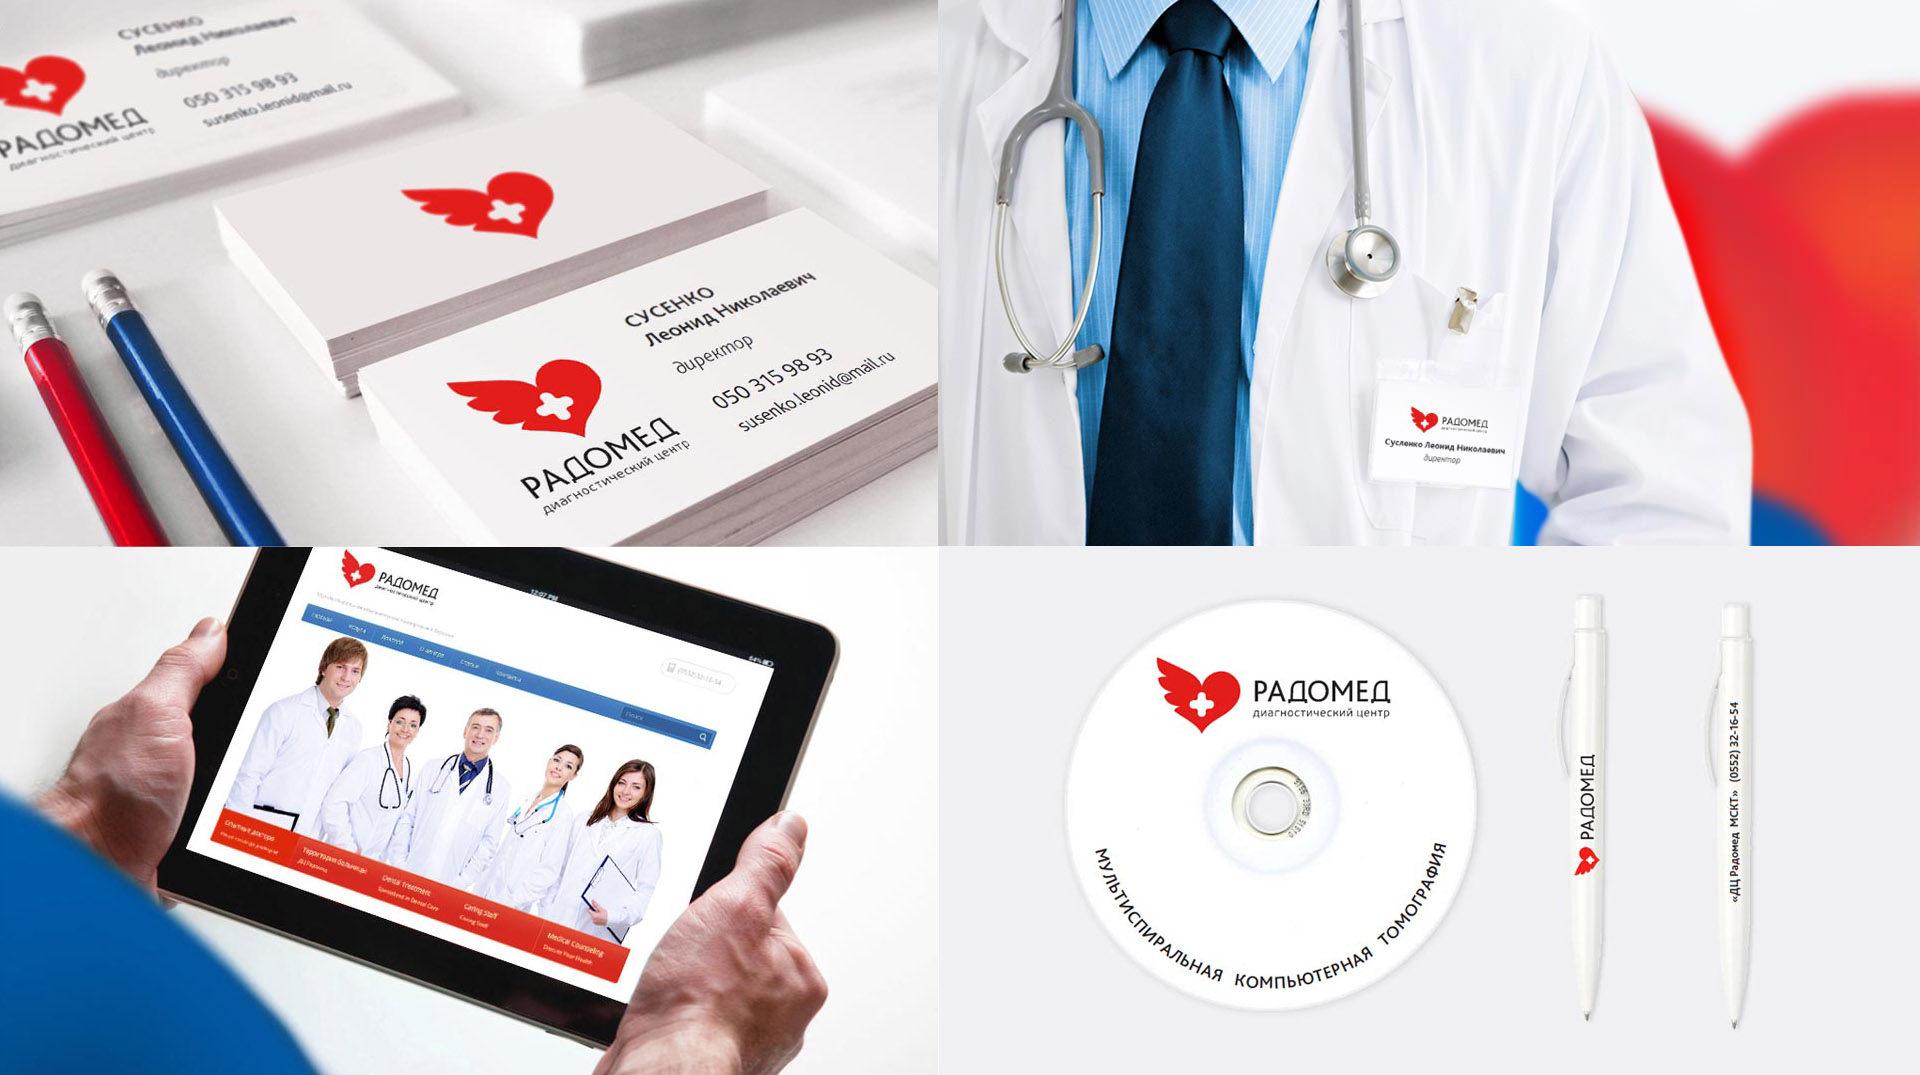 Creation of the logo диагностического центра, Diagnostic medical center logo design